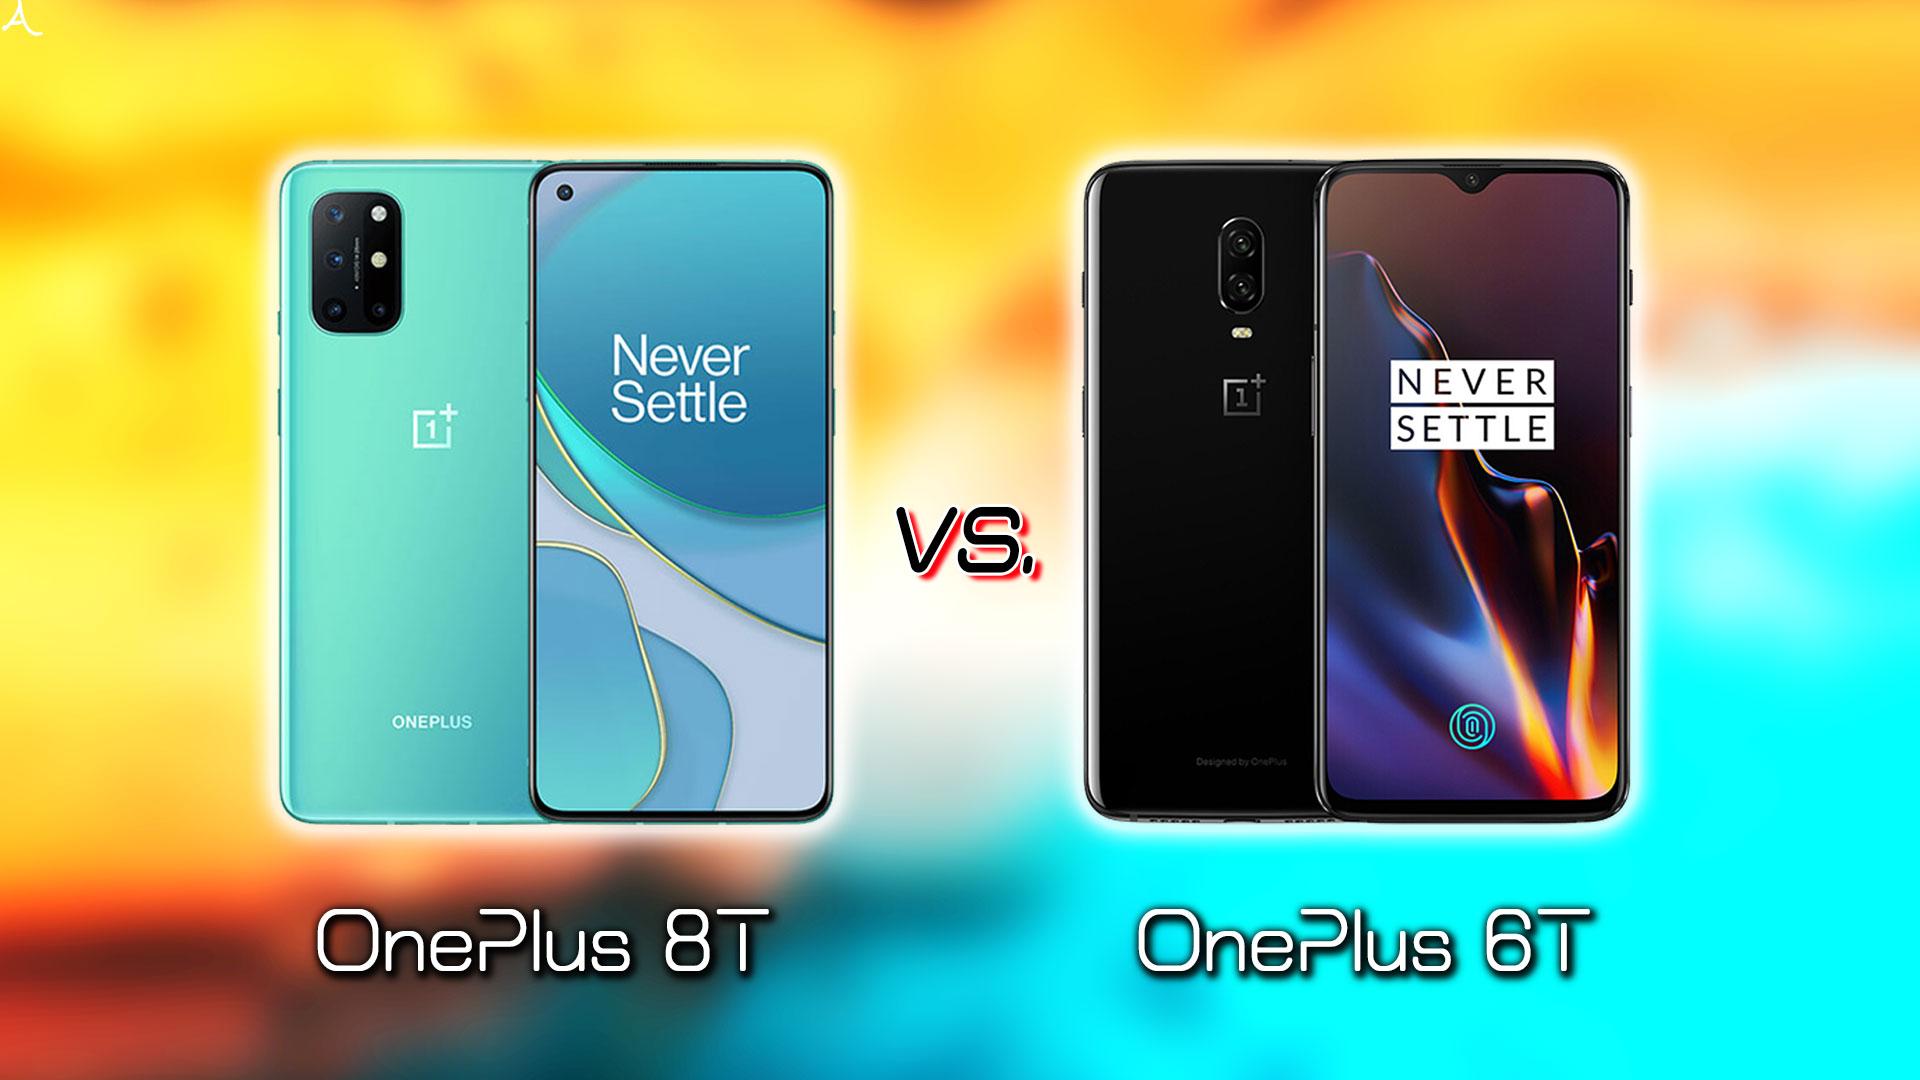 「OnePlus 8T」と「OnePlus 6T」の違いを比較:どっちを買う?